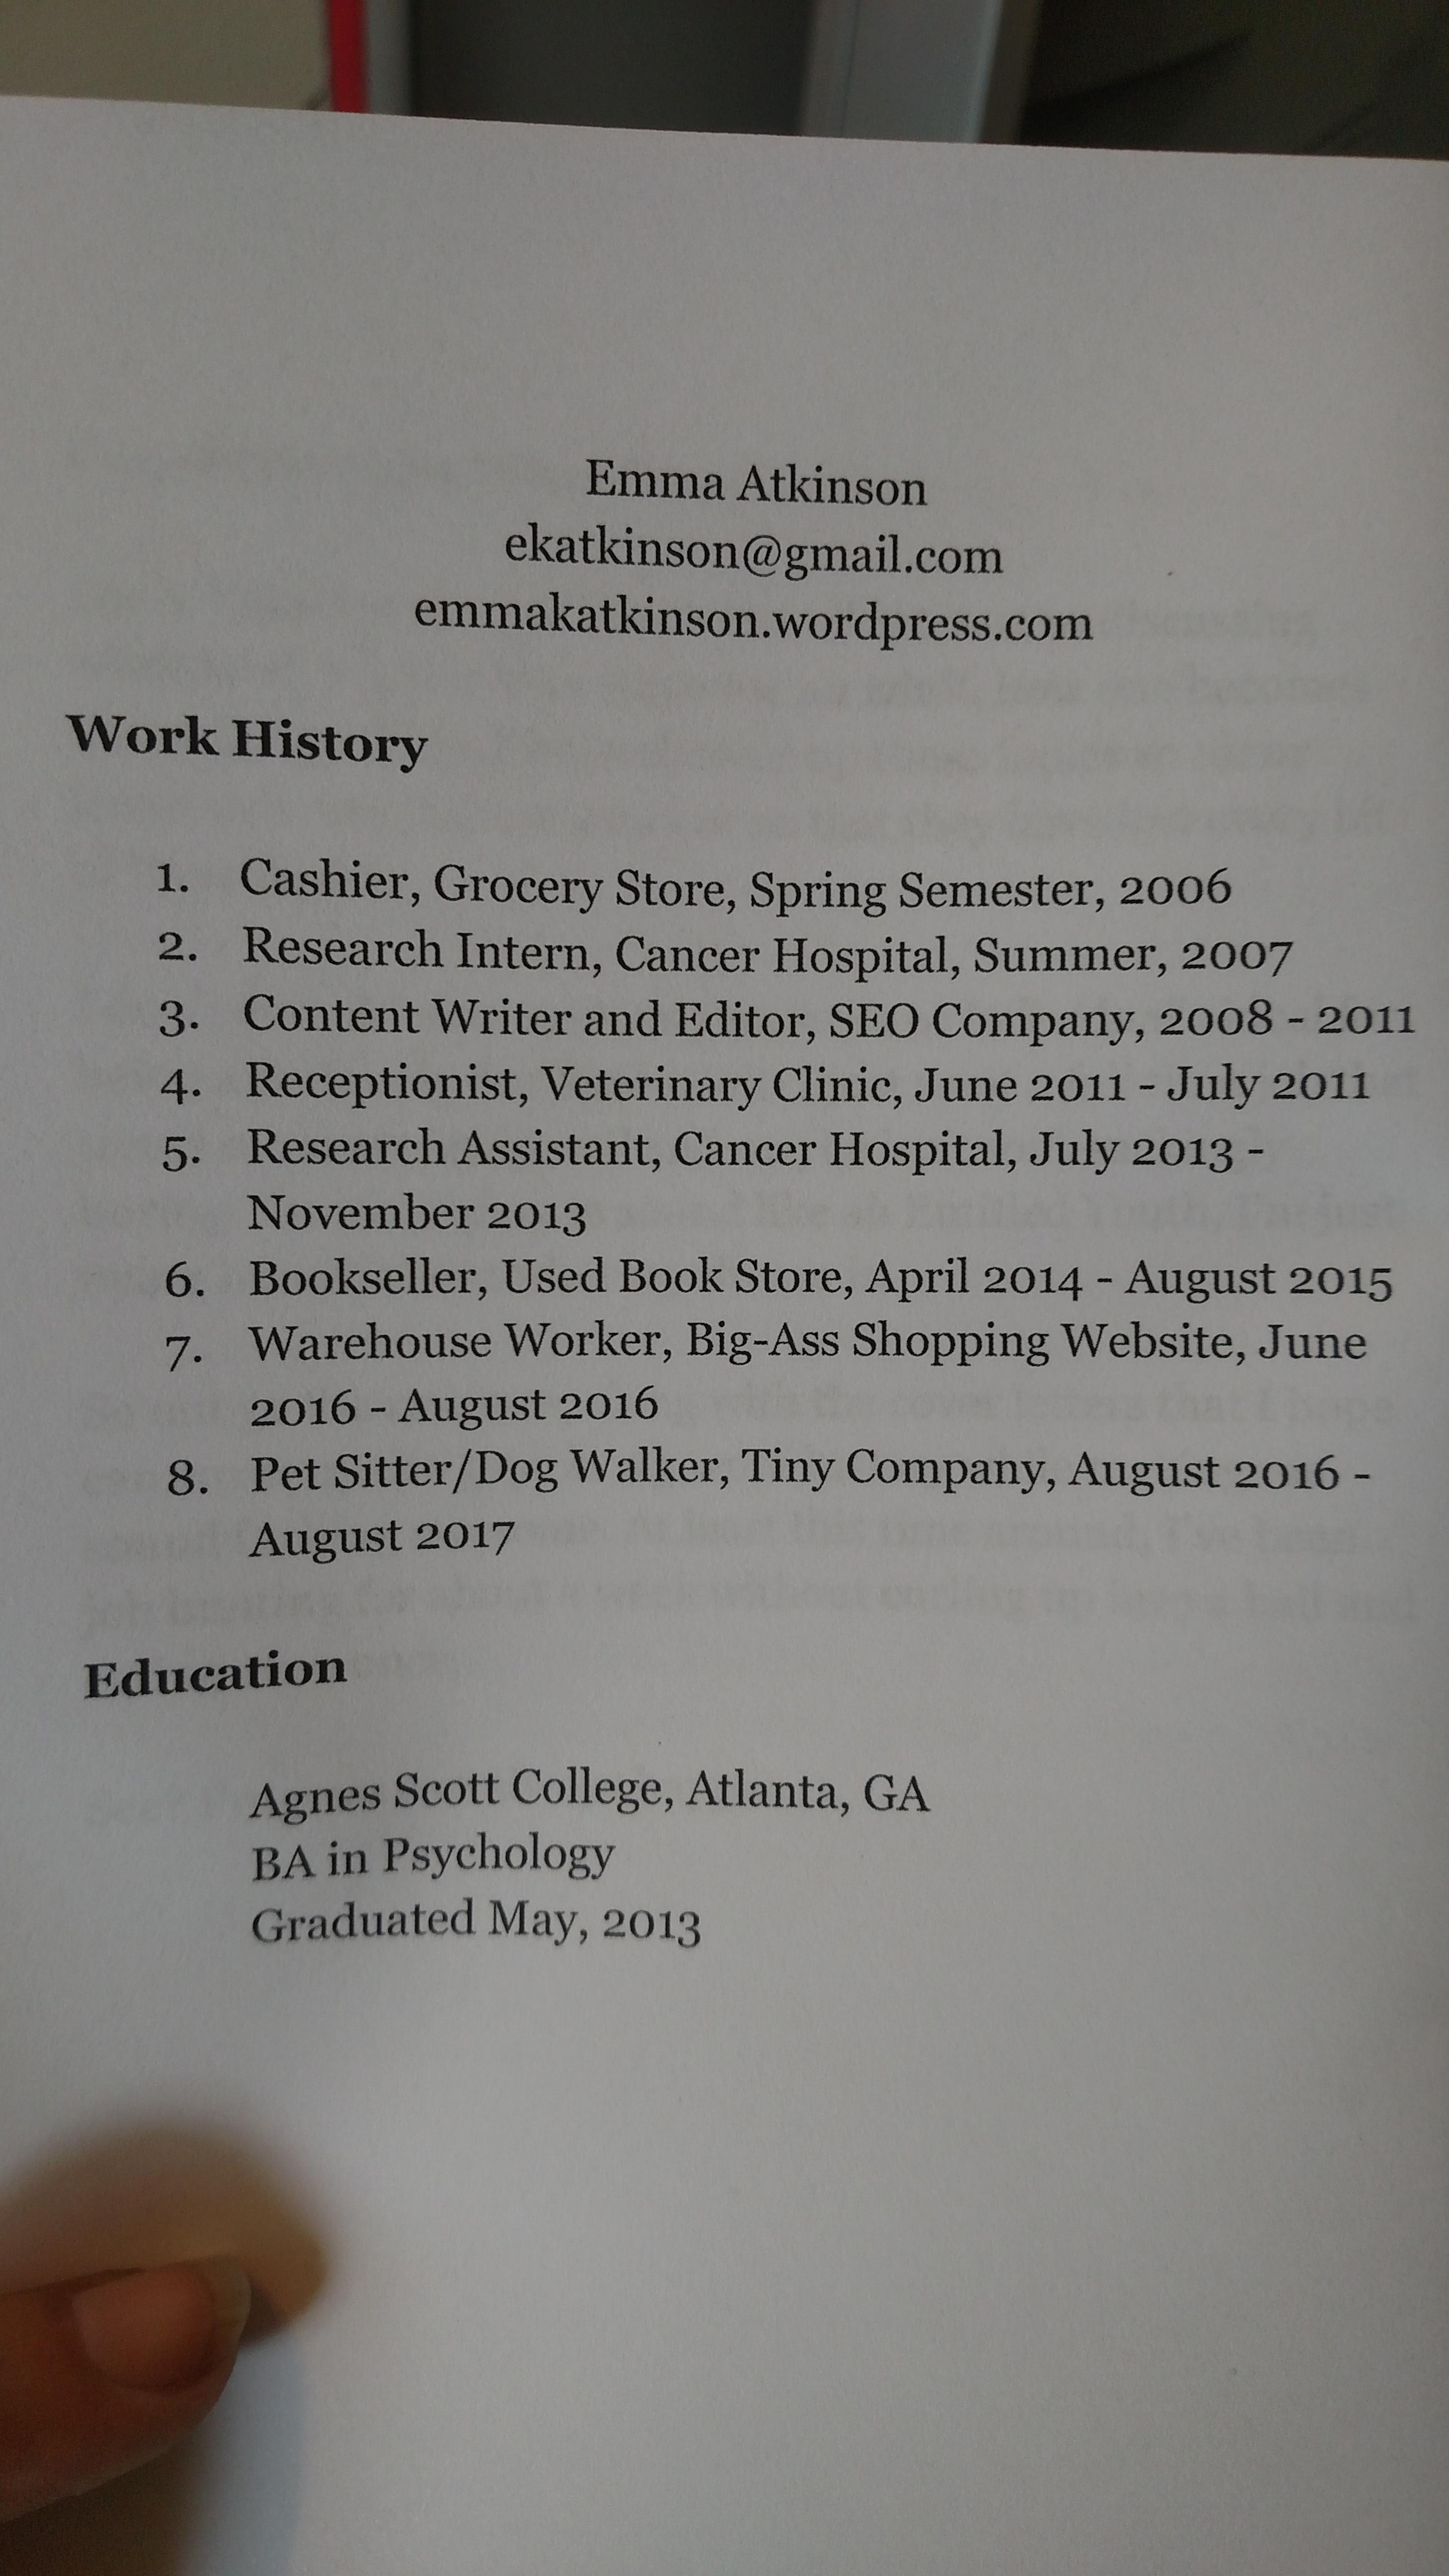 Cute Resume Job Description For Fast Food